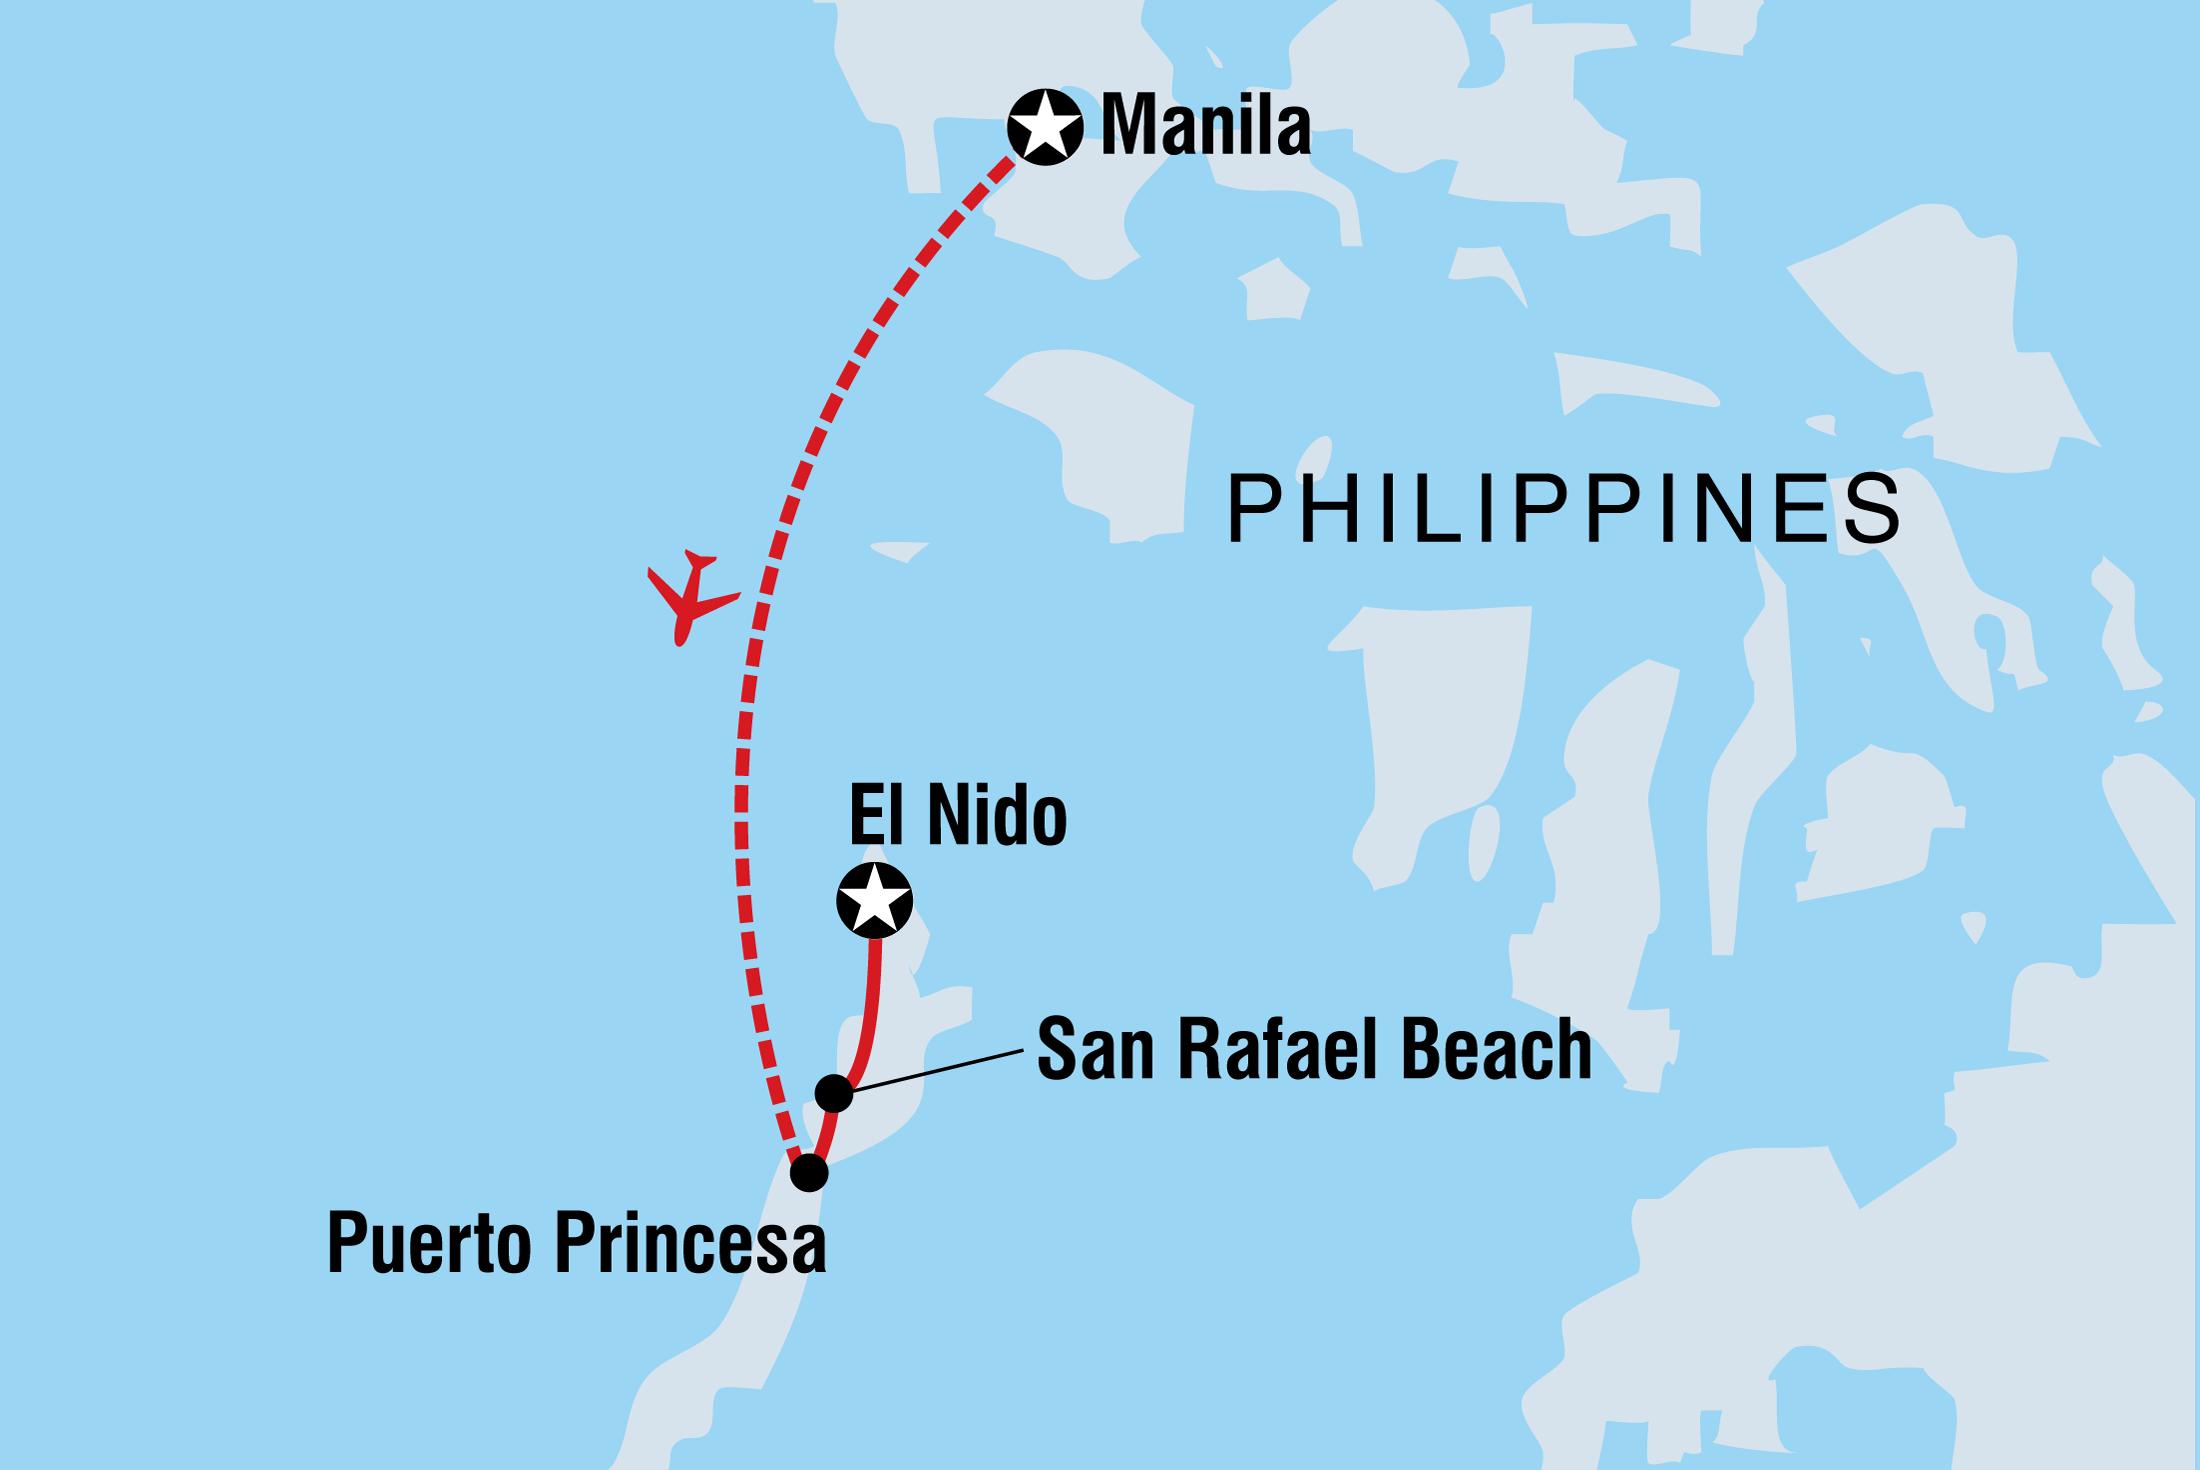 Philippines Tours & Travel | Intrepid Travel NZ